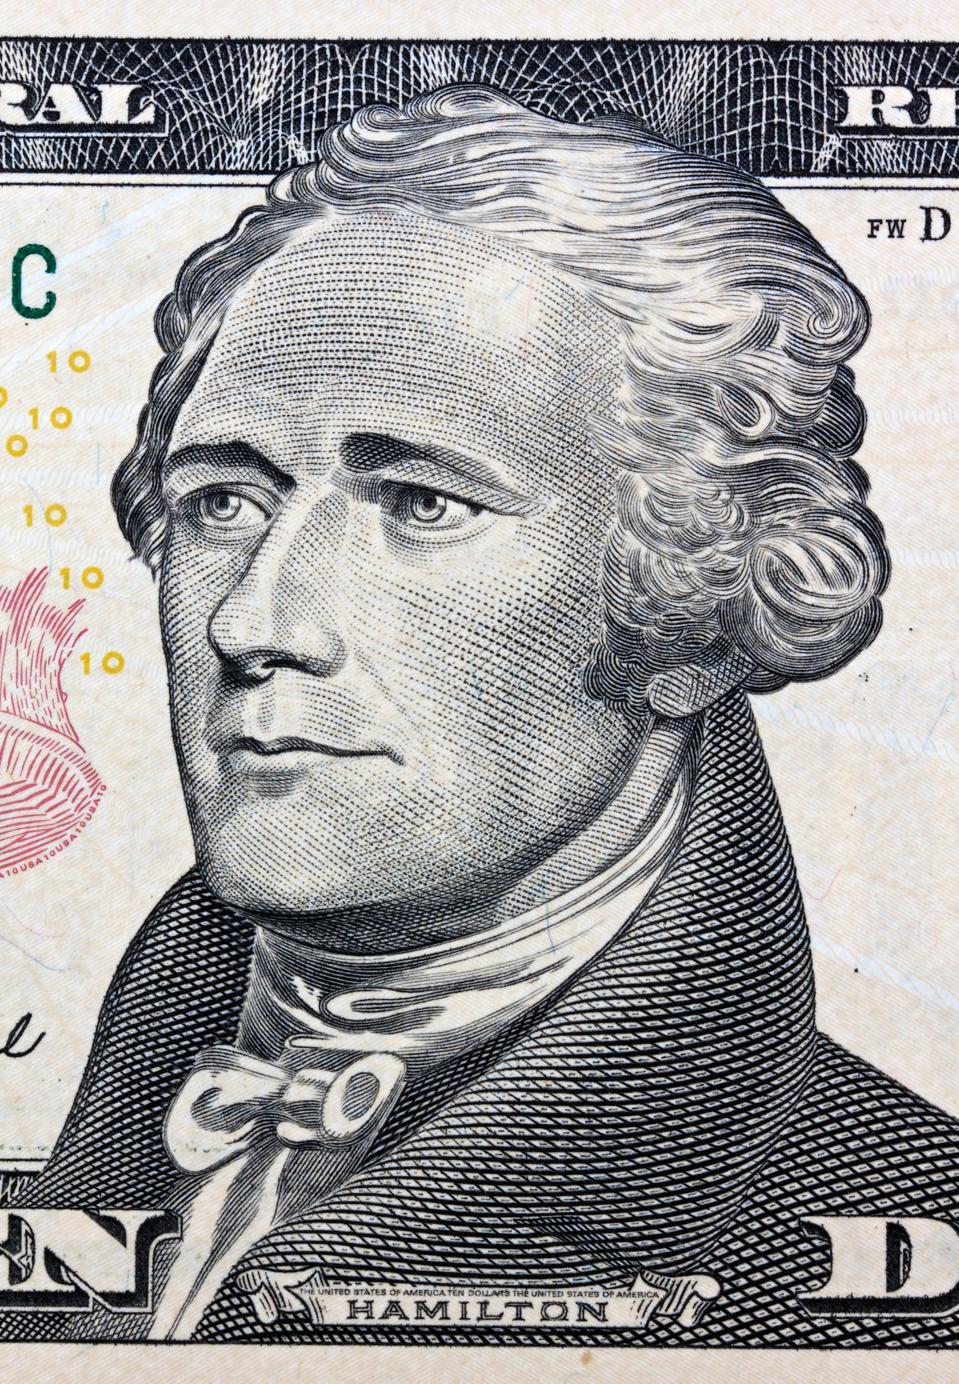 USA - Alexander Hamilton portrait printed on the 10 Dollar banknote